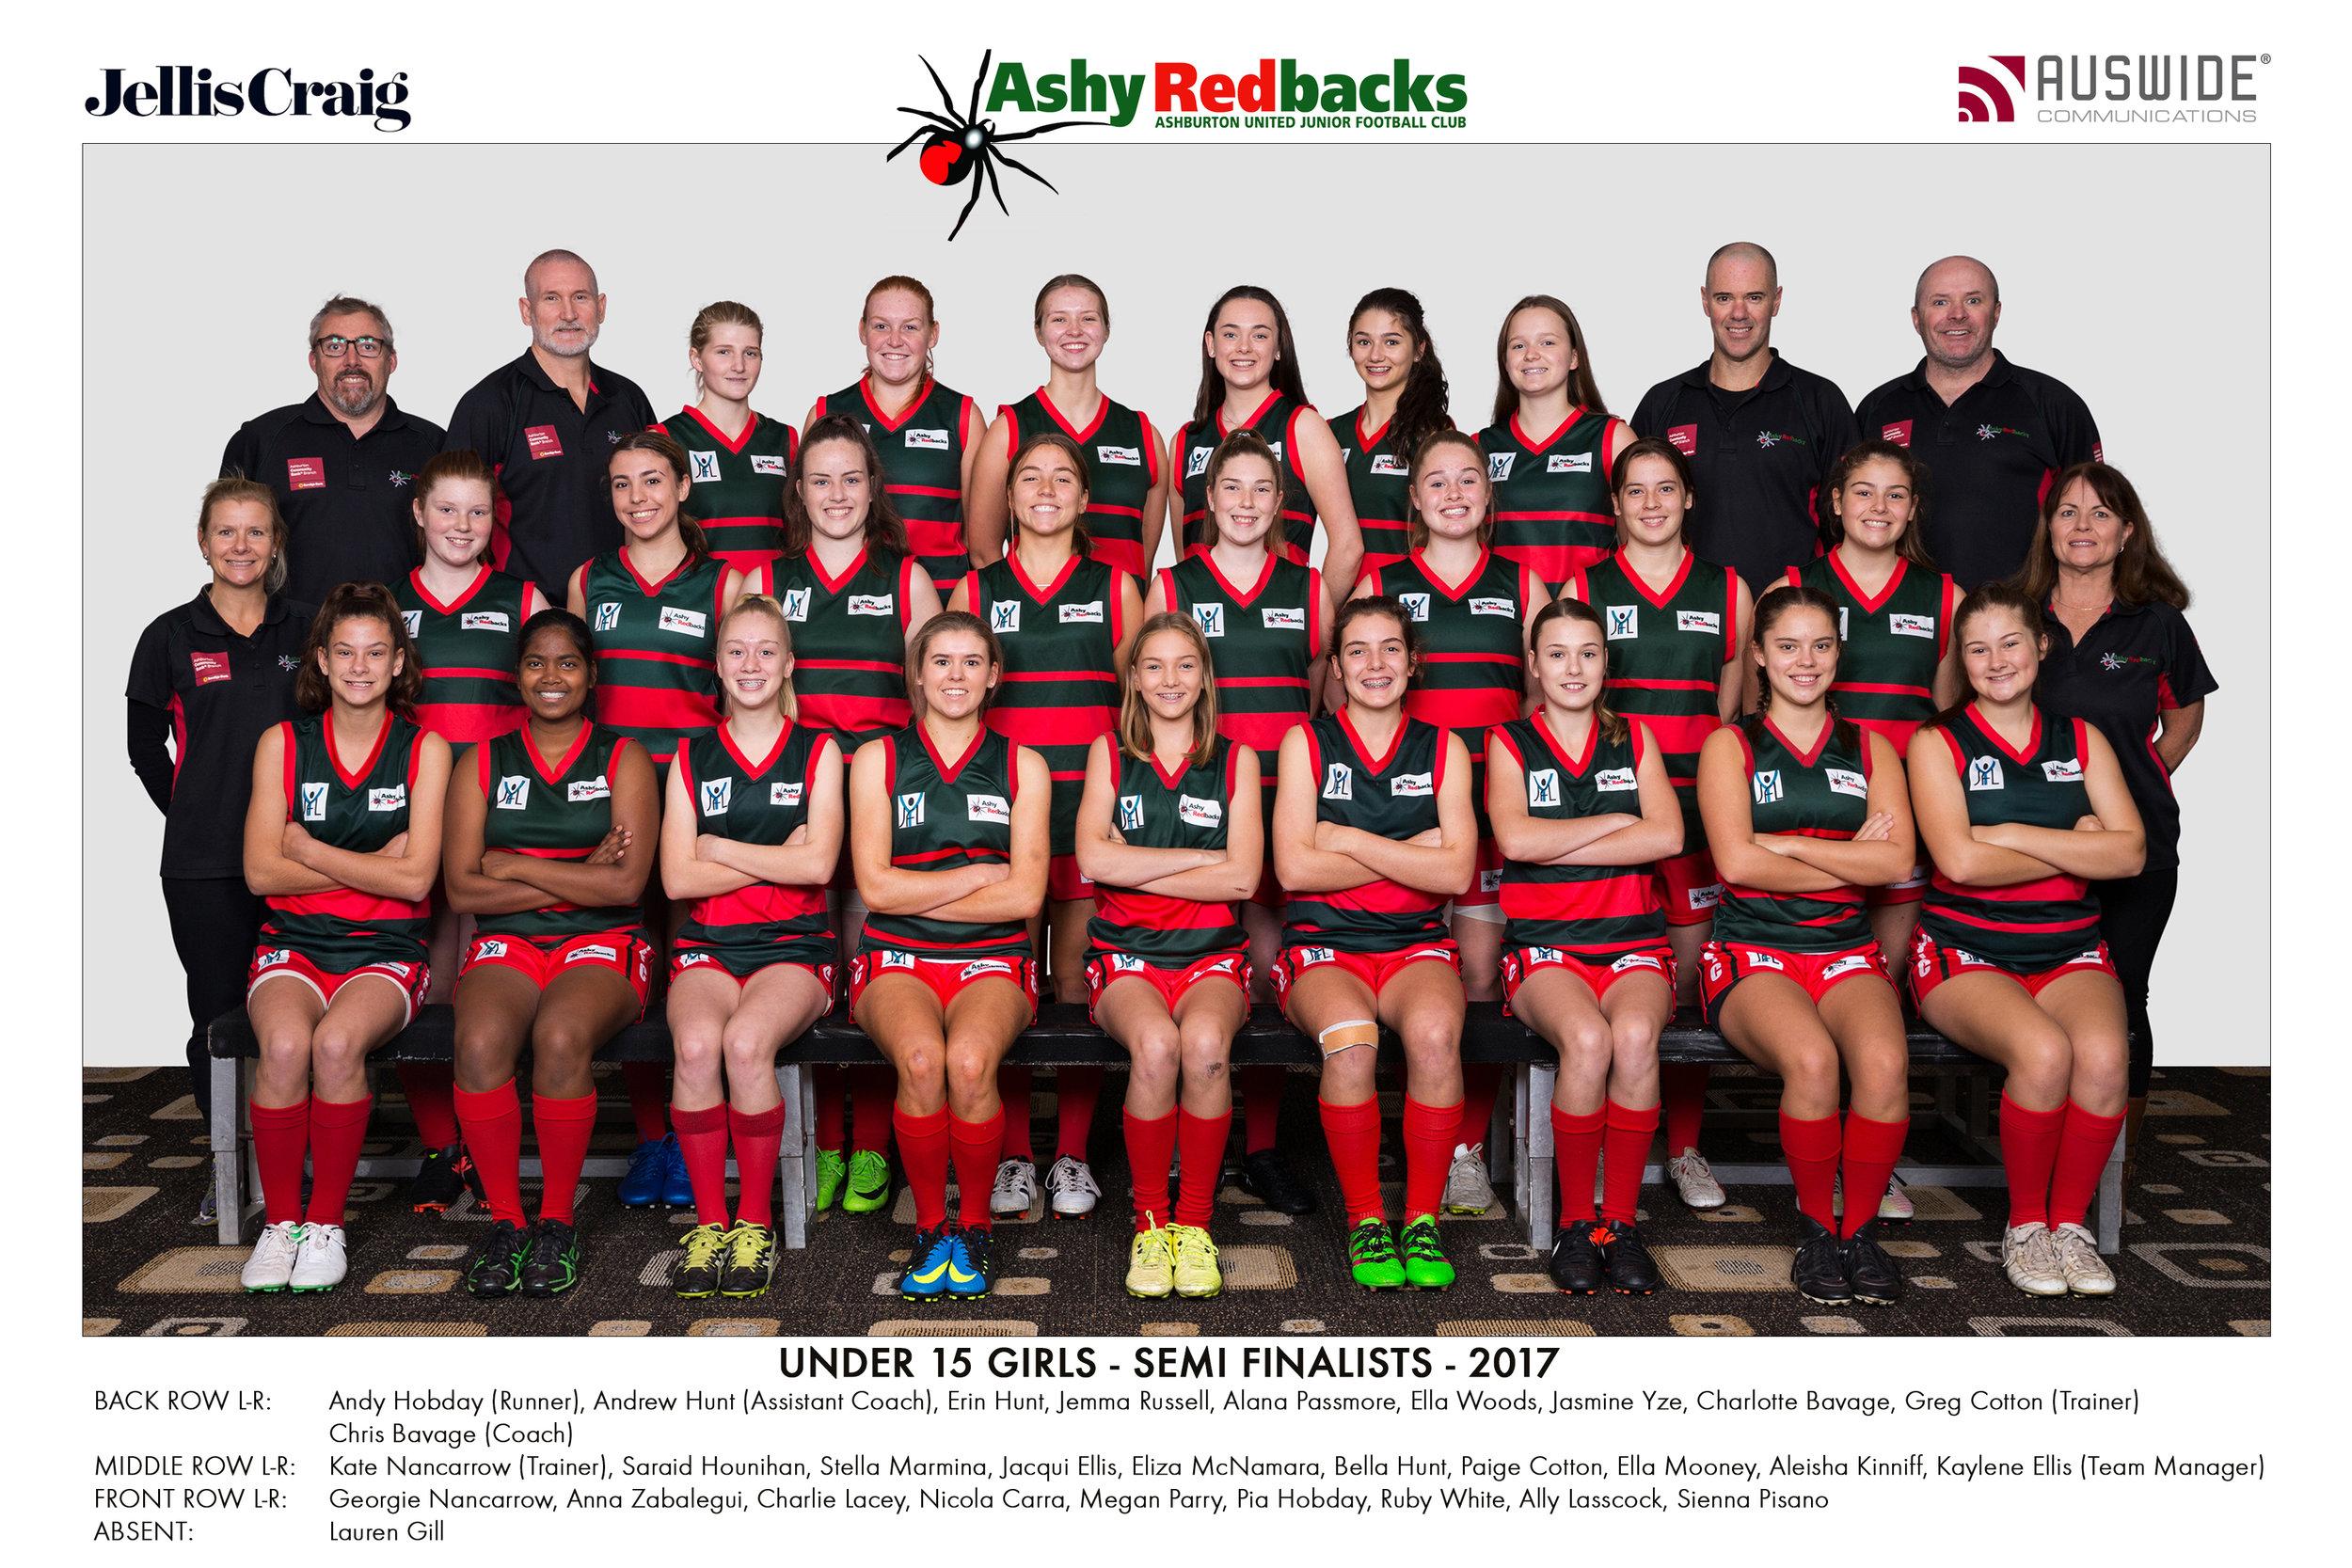 15girls Team Photo.jpg